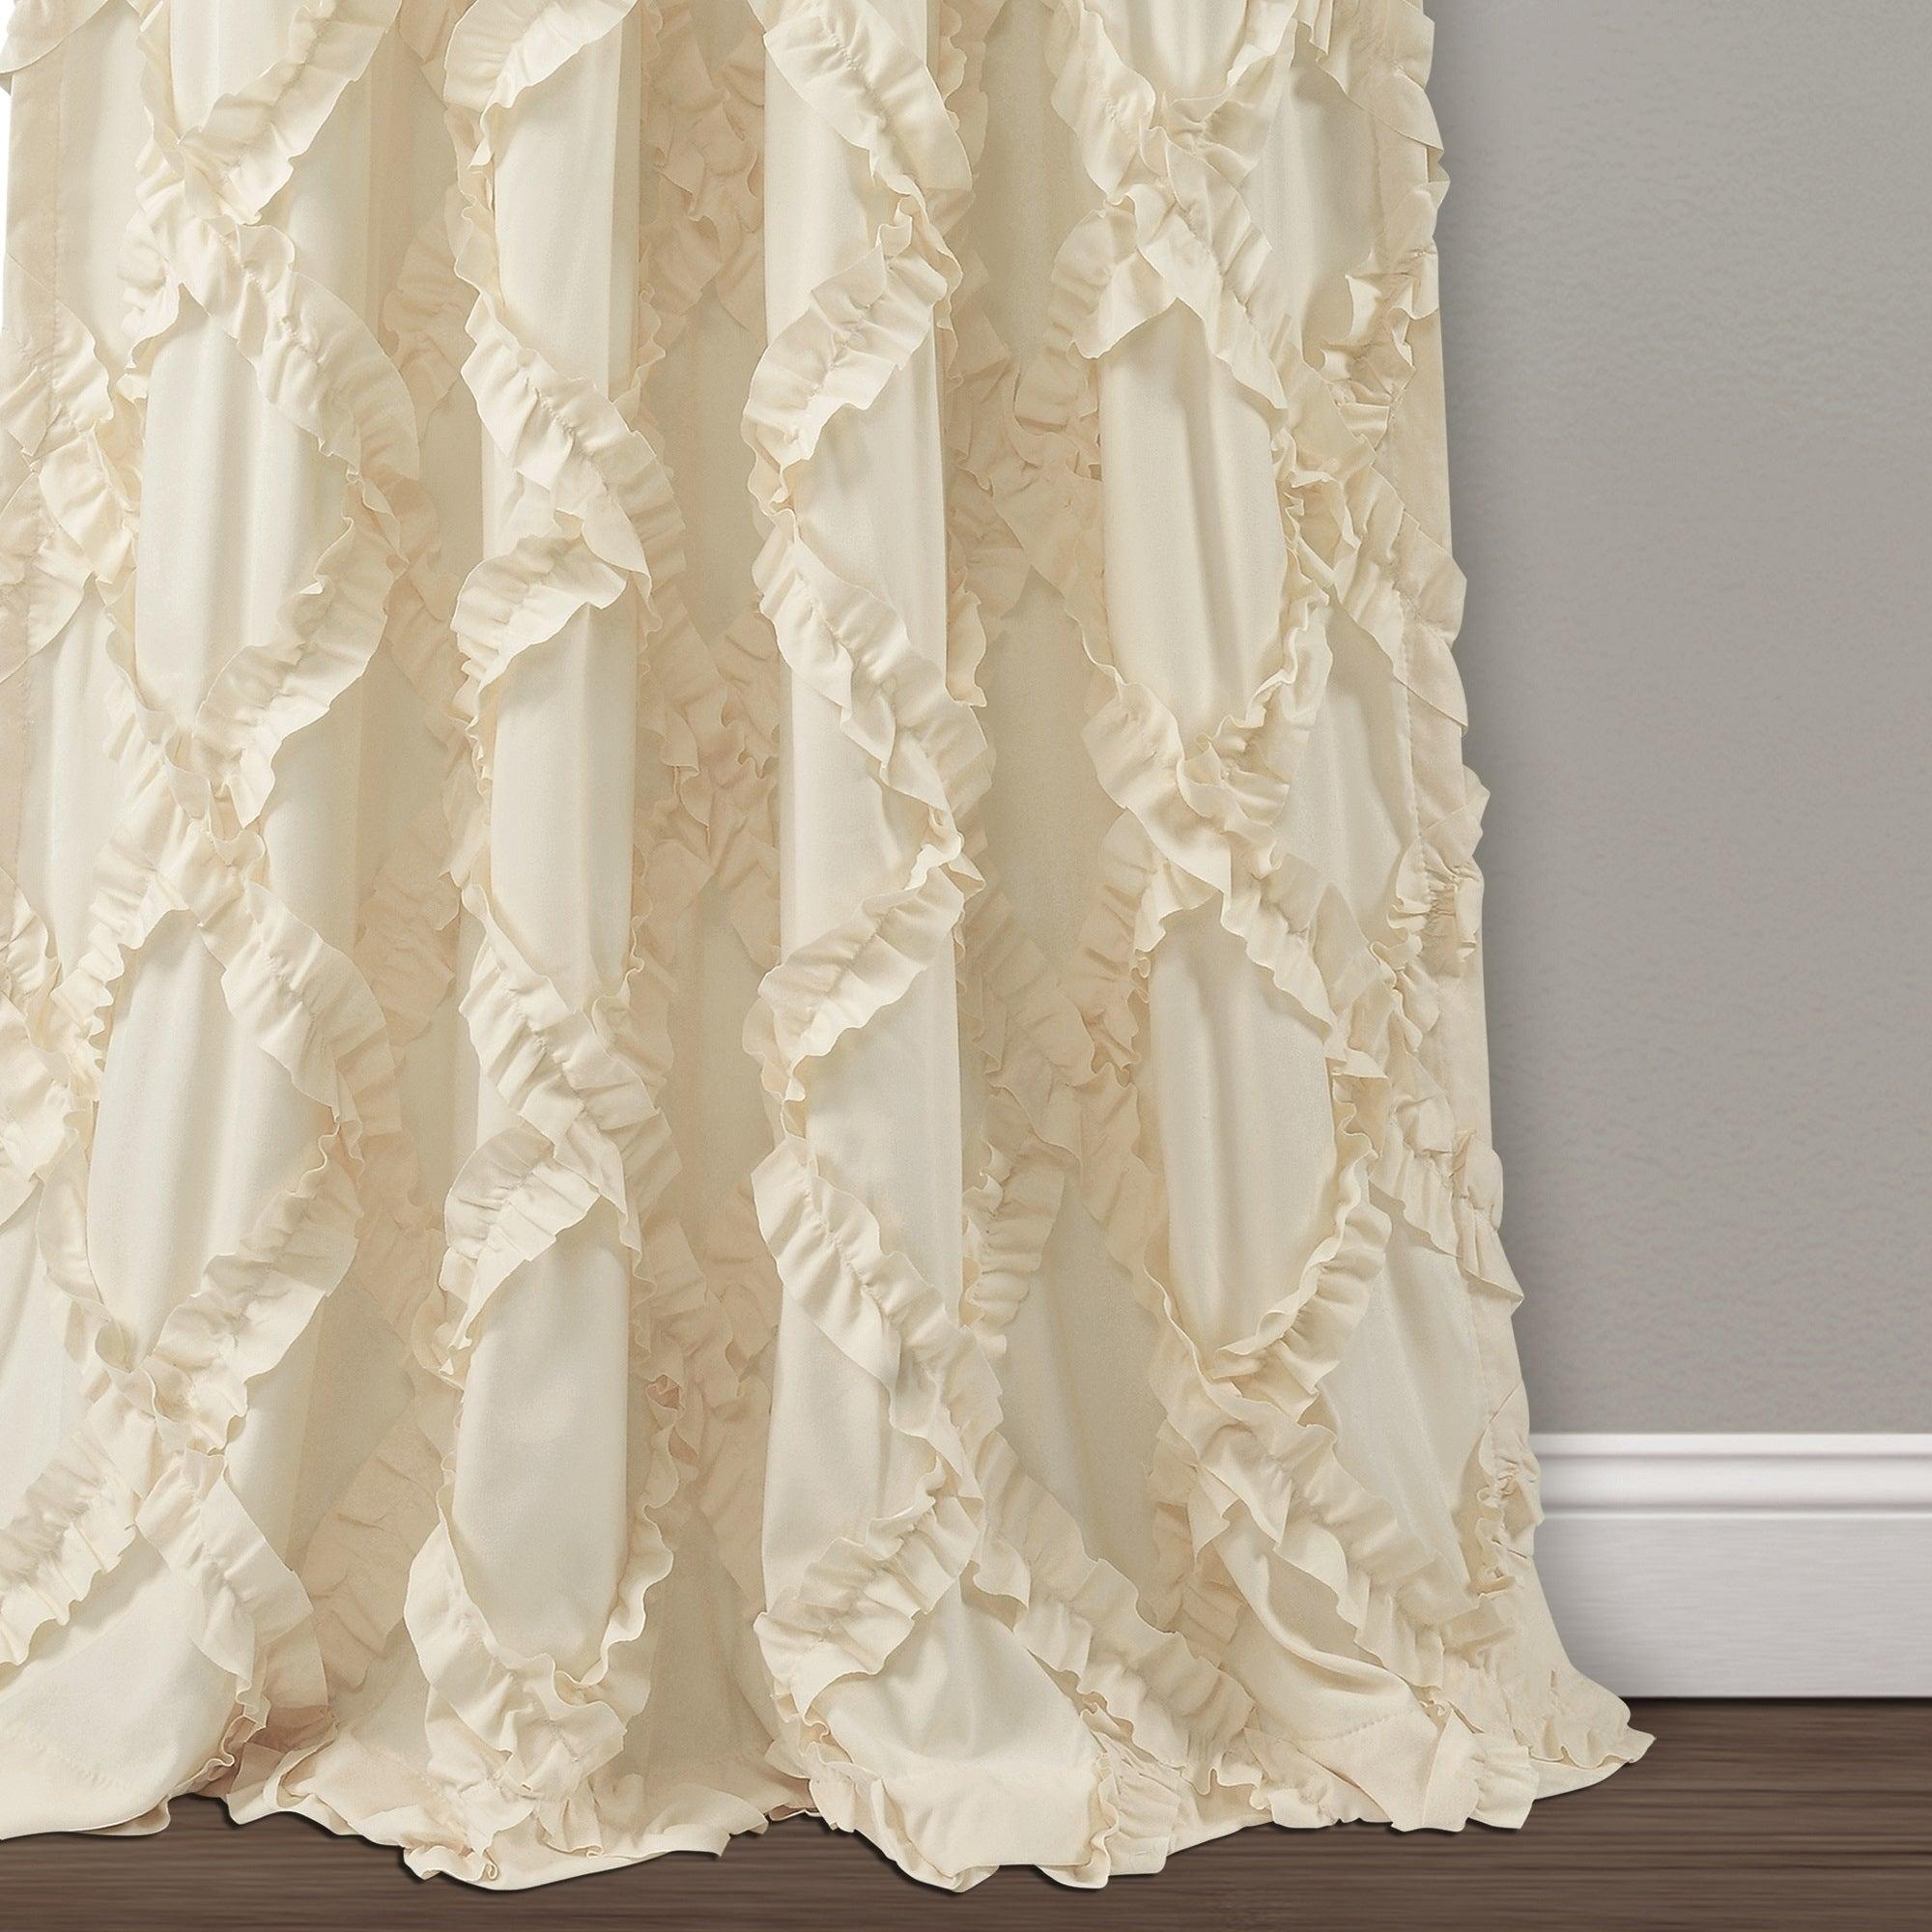 Lush Decor Ruffle Diamond Curtain Panel Pair With Ruffle Diamond Curtain Panel Pairs (View 13 of 20)